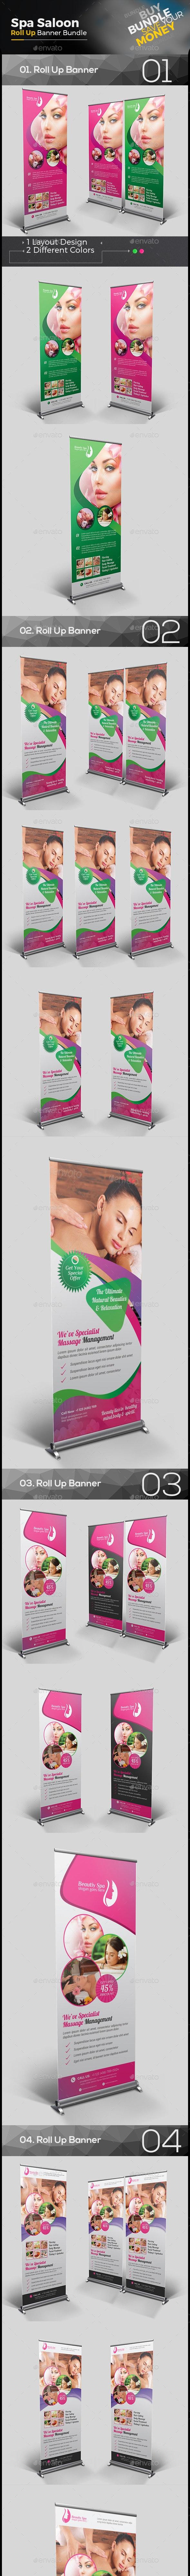 Spa Salon Roll Up Banner Bundle - Signage Print Templates